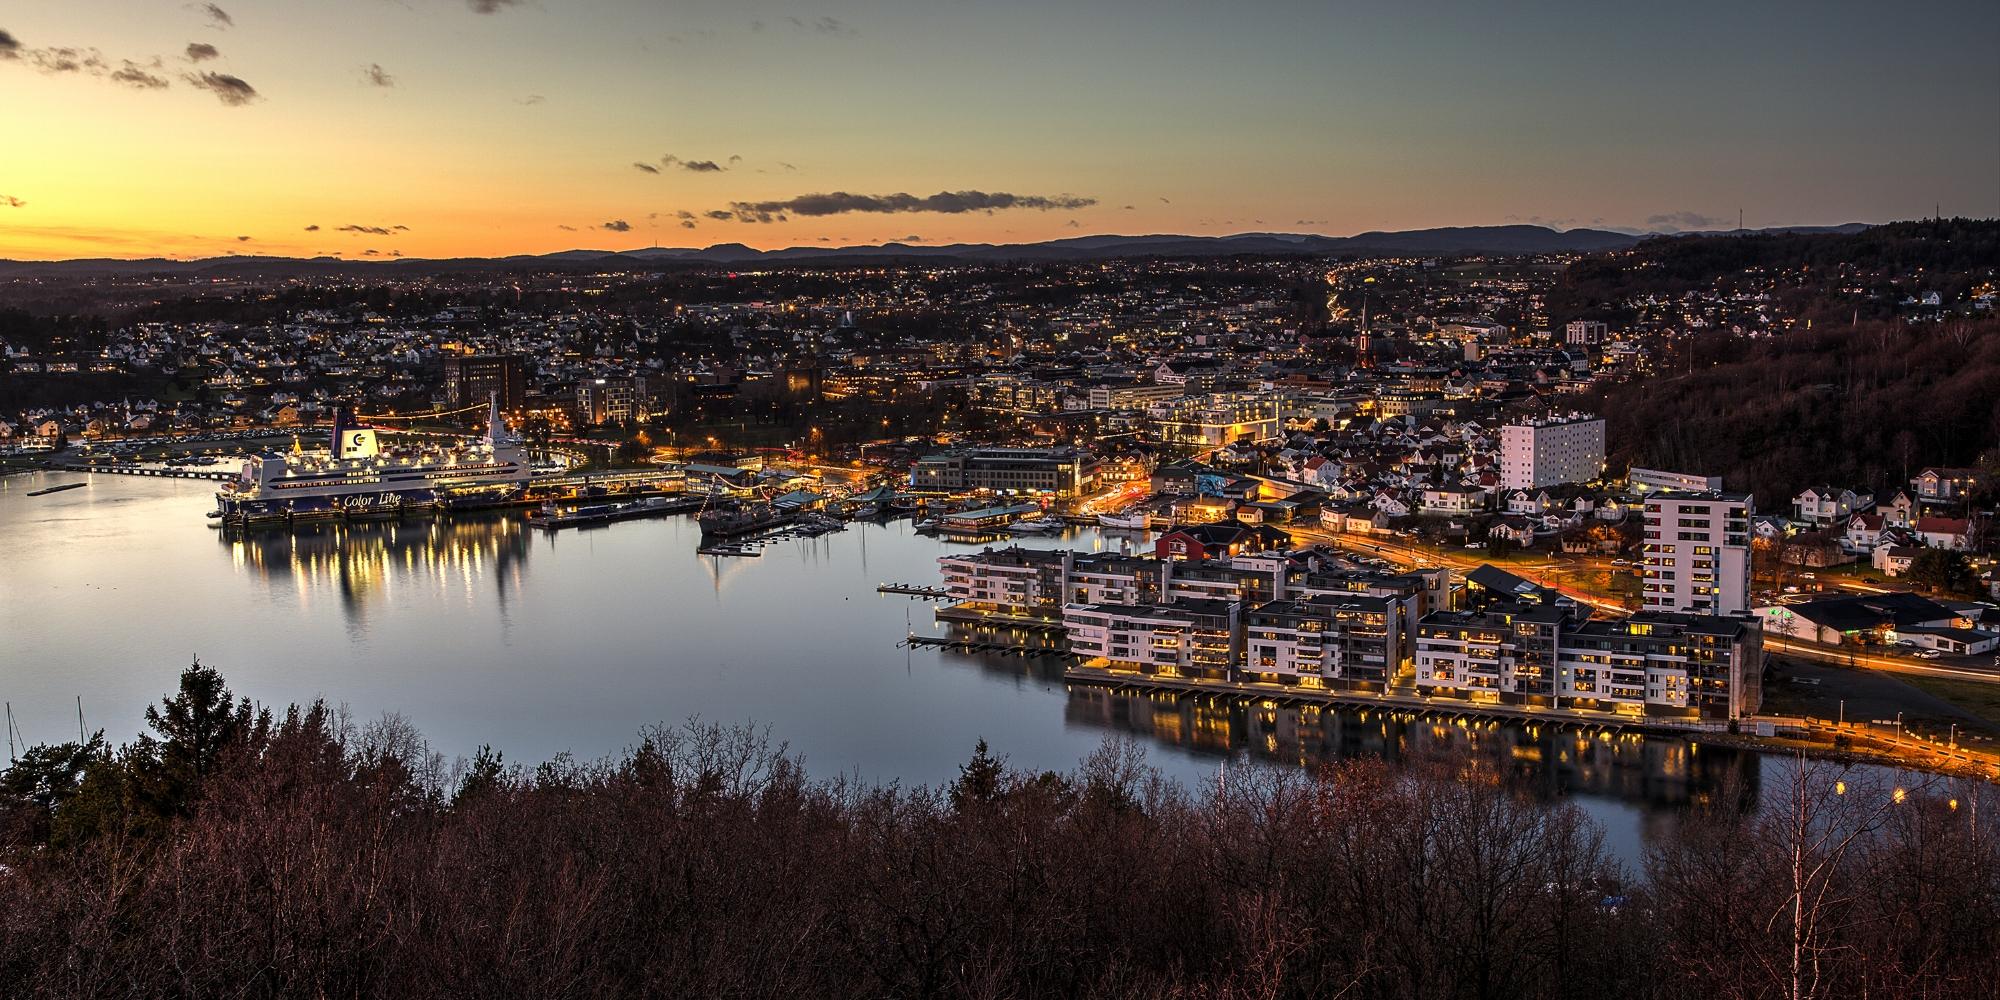 sandefjord dating norway speed dating norway geilo